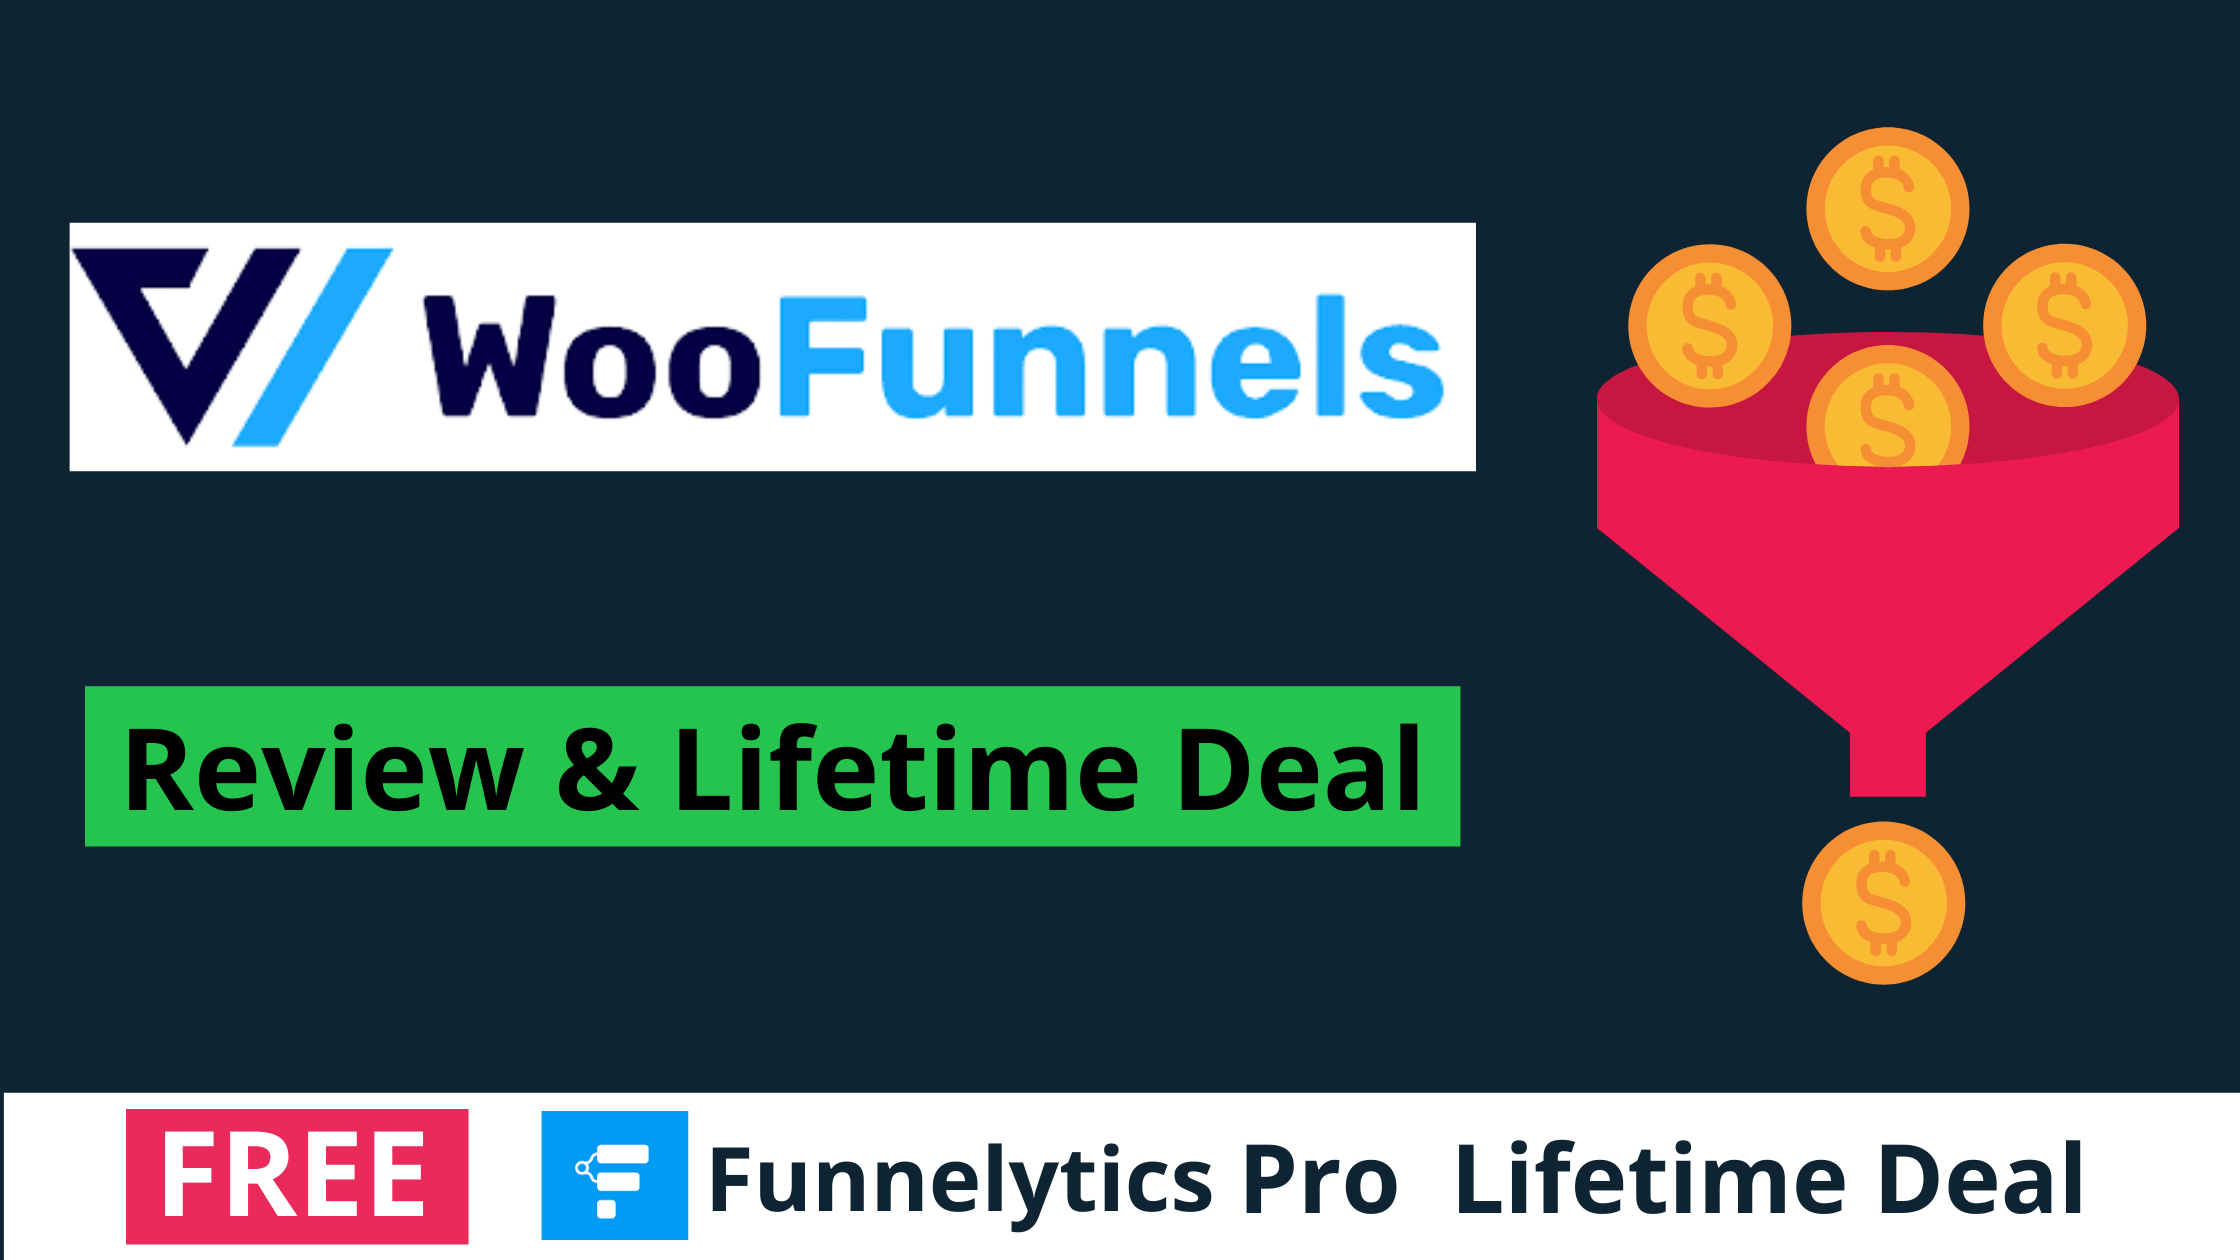 woofunnels review - woofunnels lifetime deal